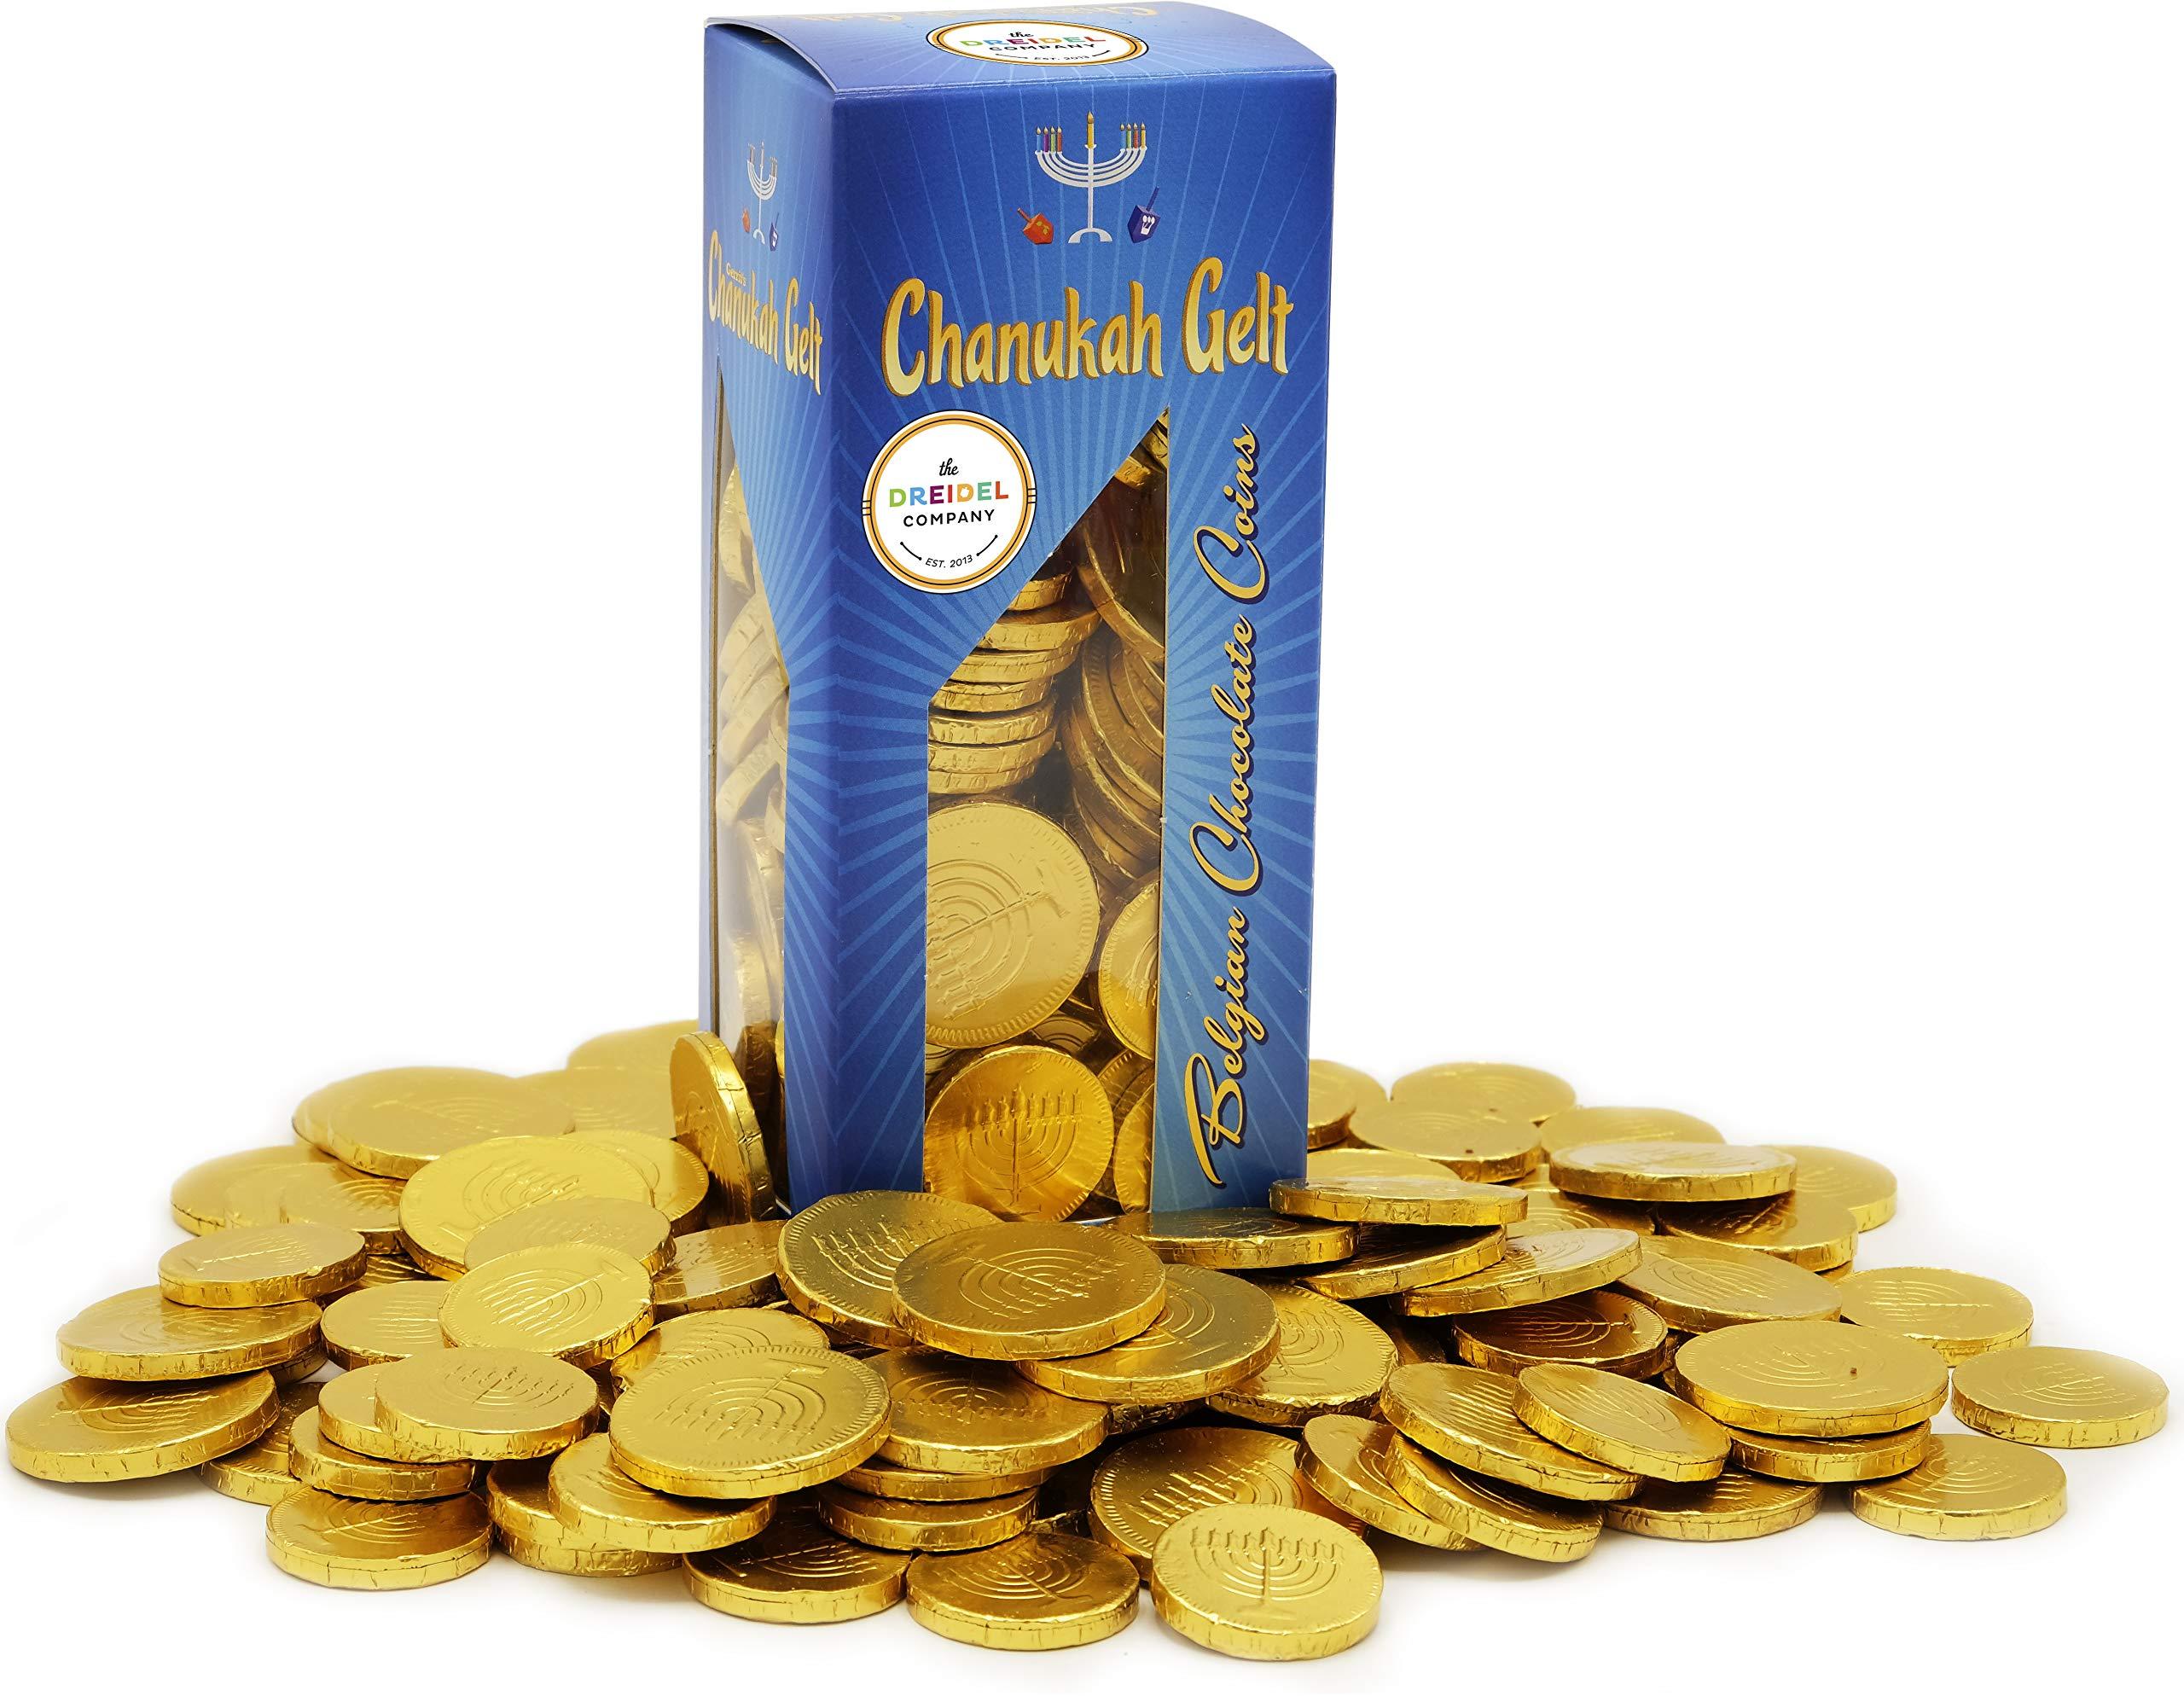 Hanukkah Chocolate Gelt - Nut Free - Belgian Milk Chocolate Coins - 1LB - Over 100 Coins - OU D Kosher Chanukah Gelt by The Dreidel Company